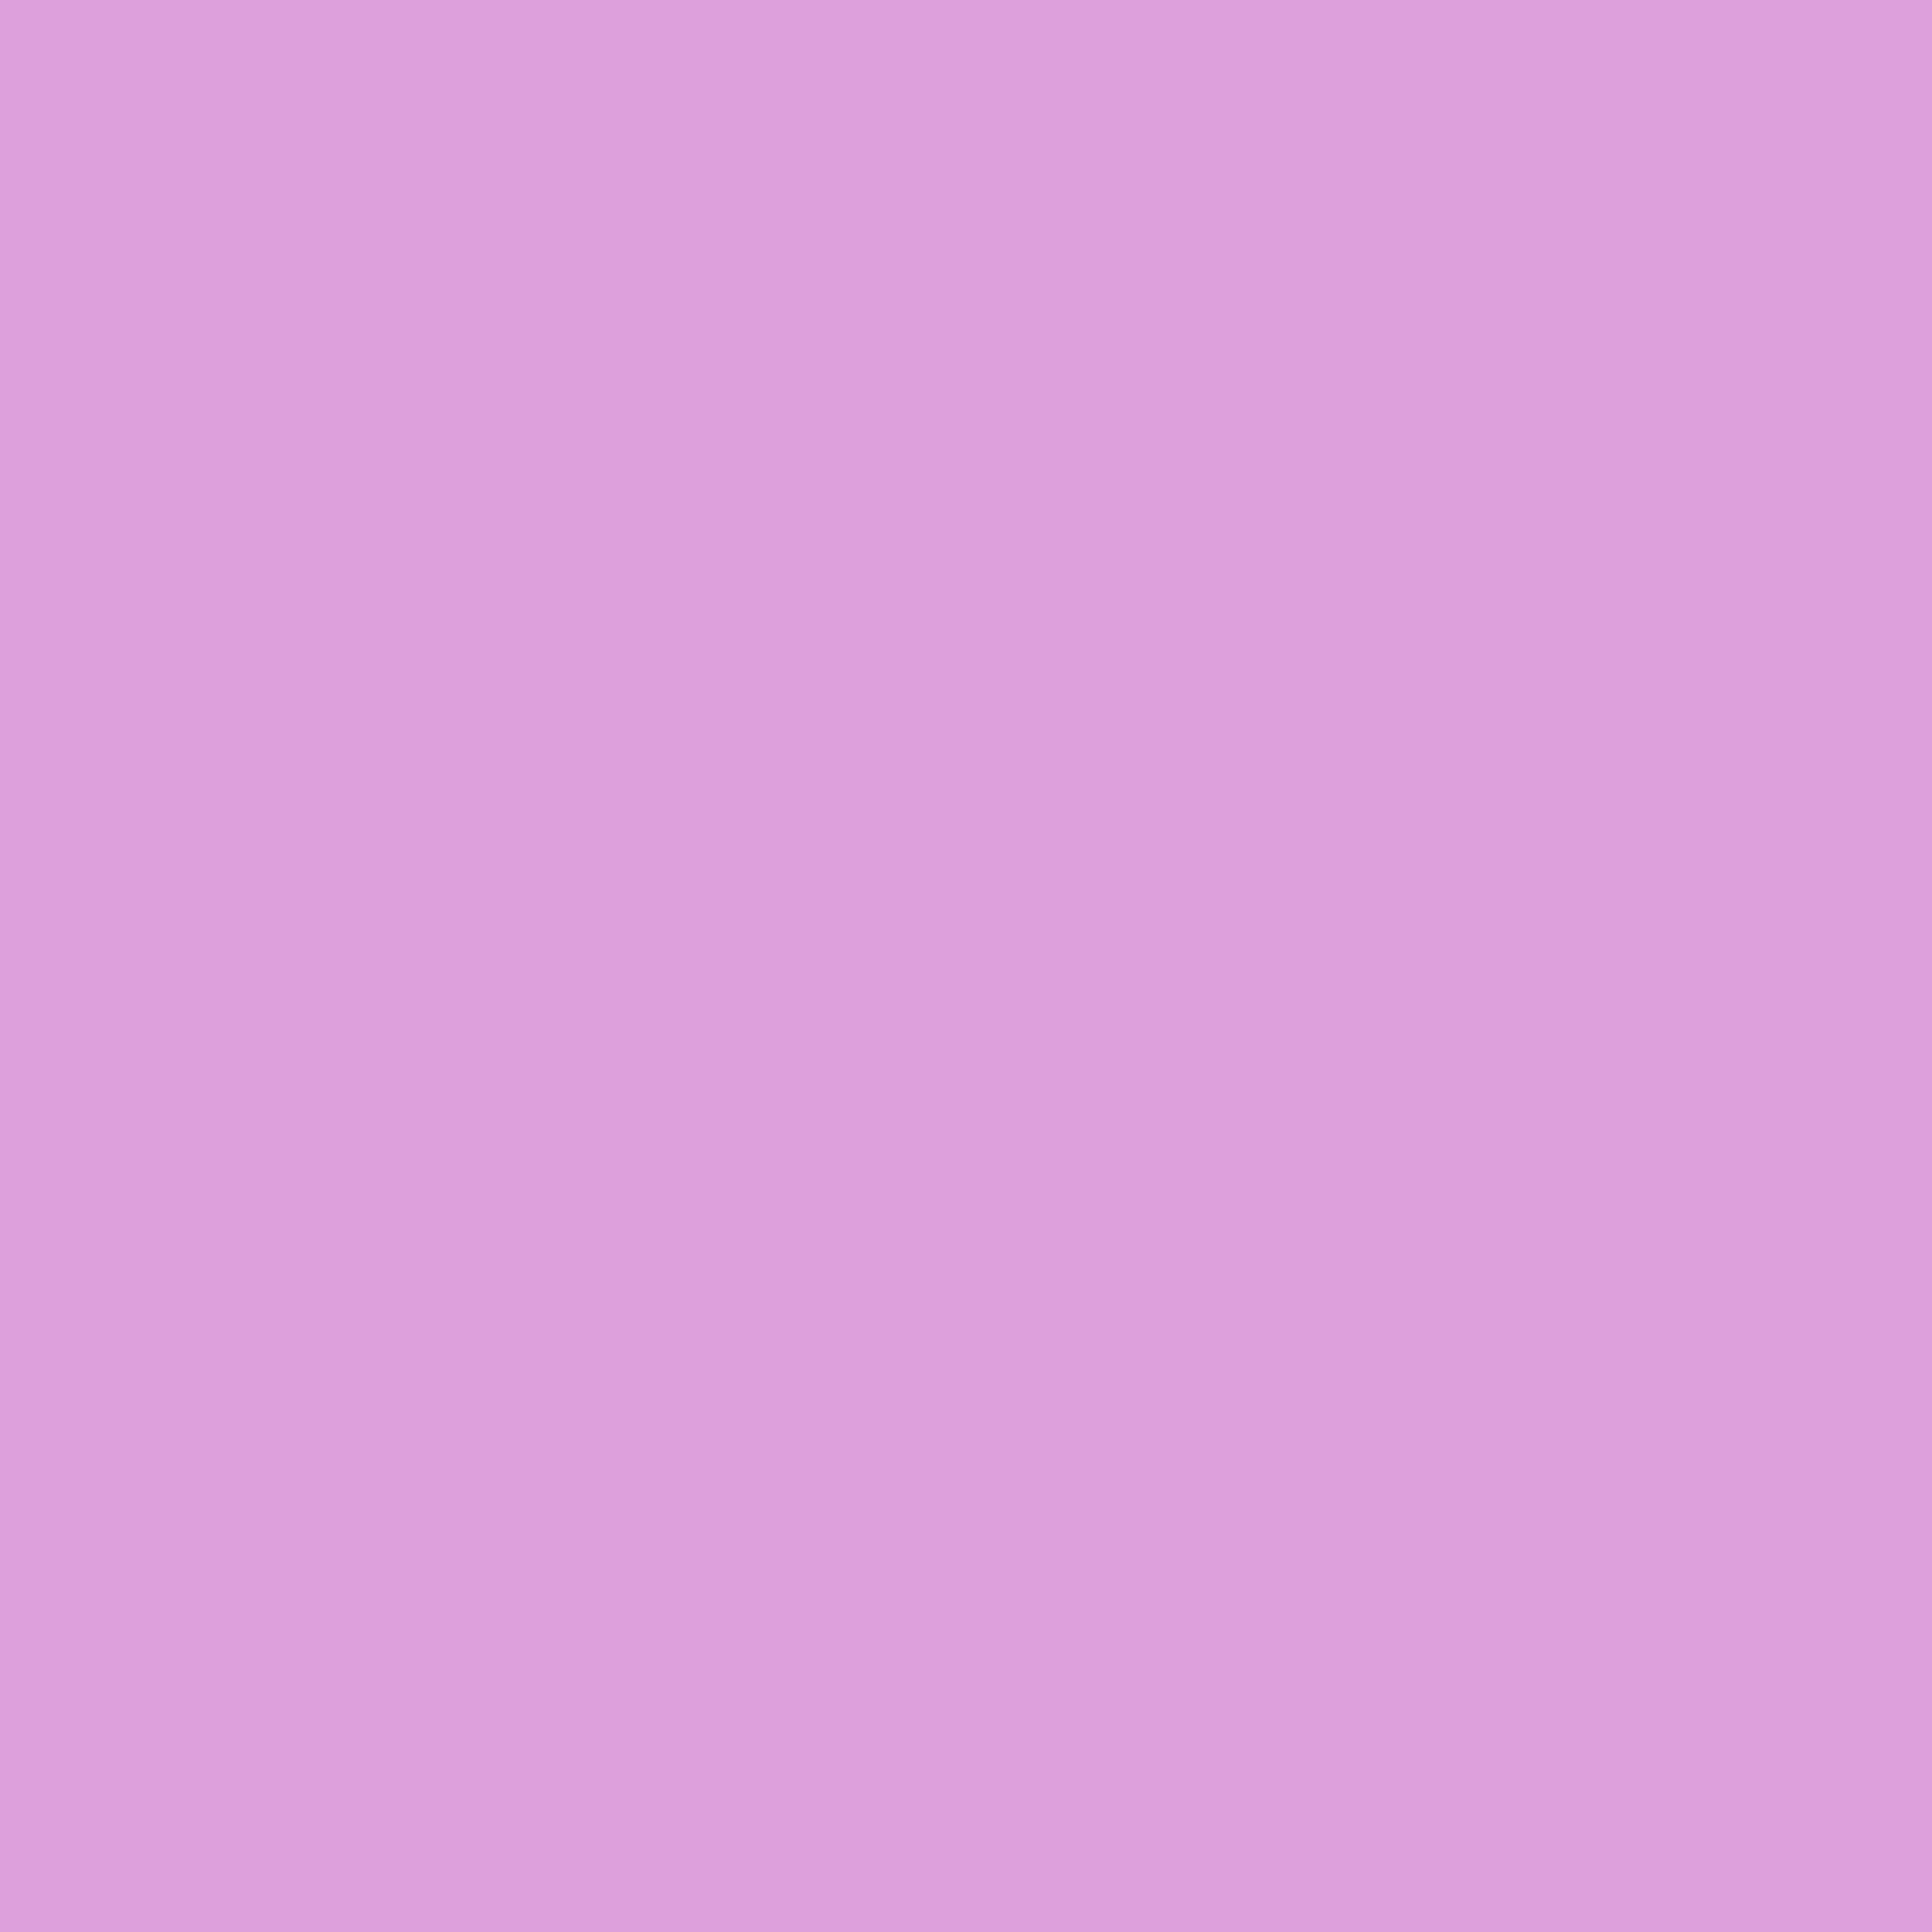 2048x2048 Plum Web Solid Color Background